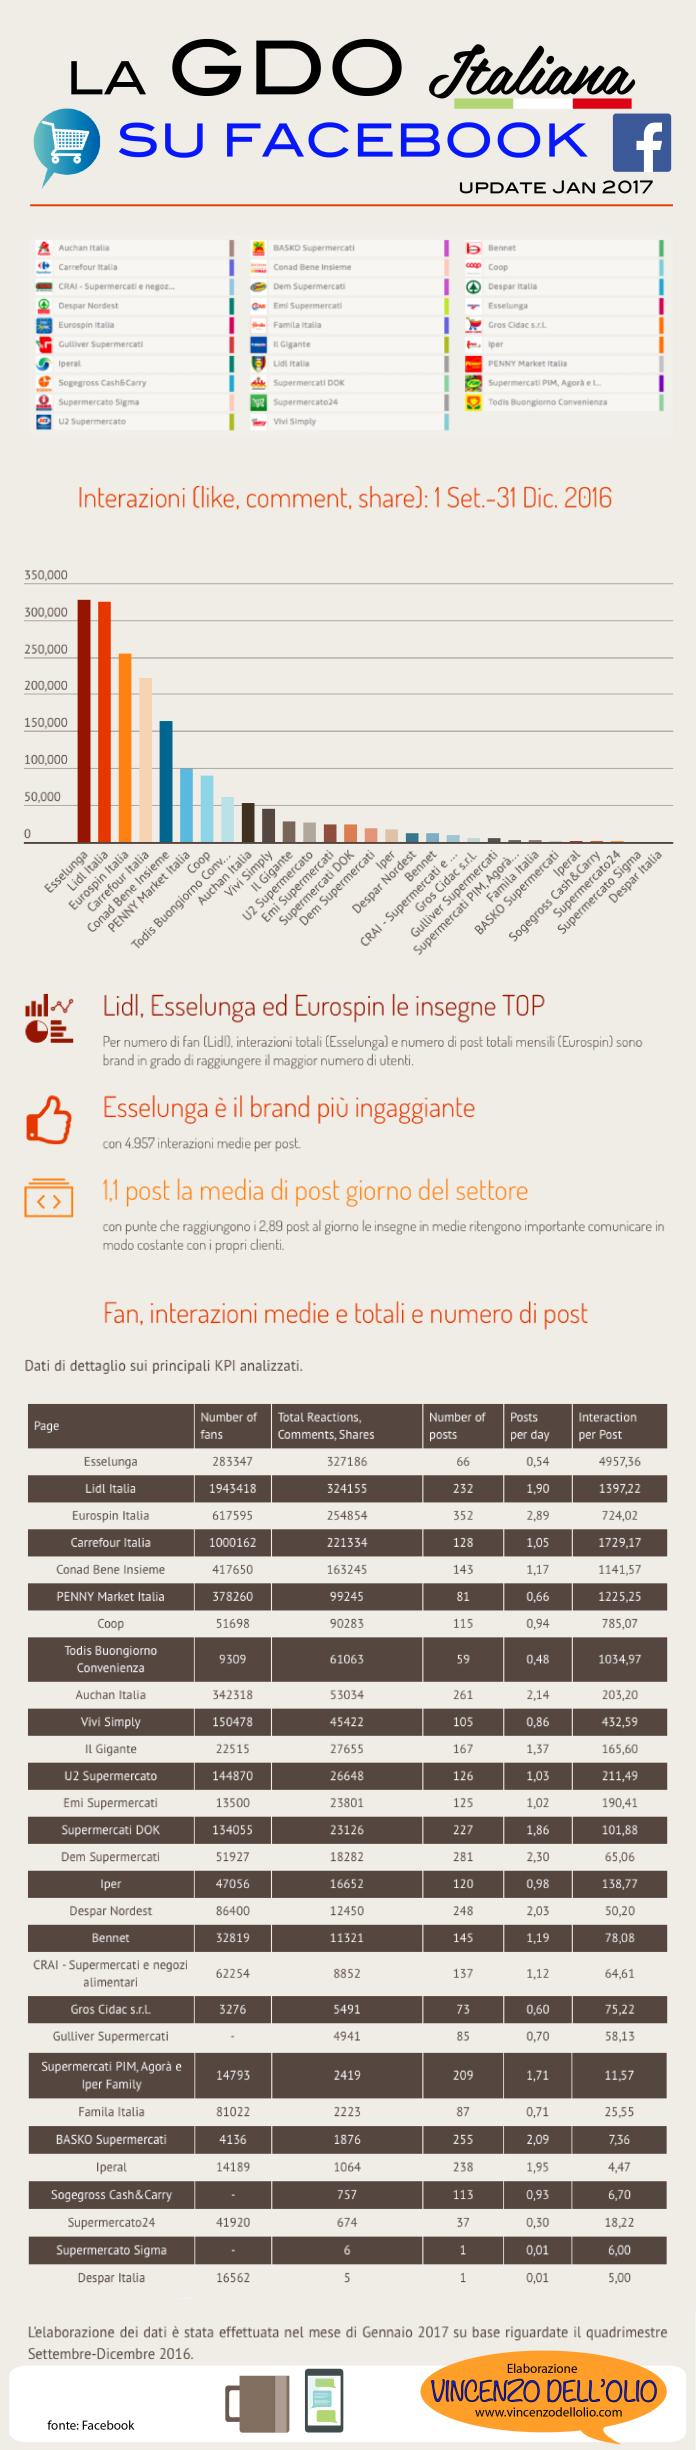 Gdo italia facebook infografica